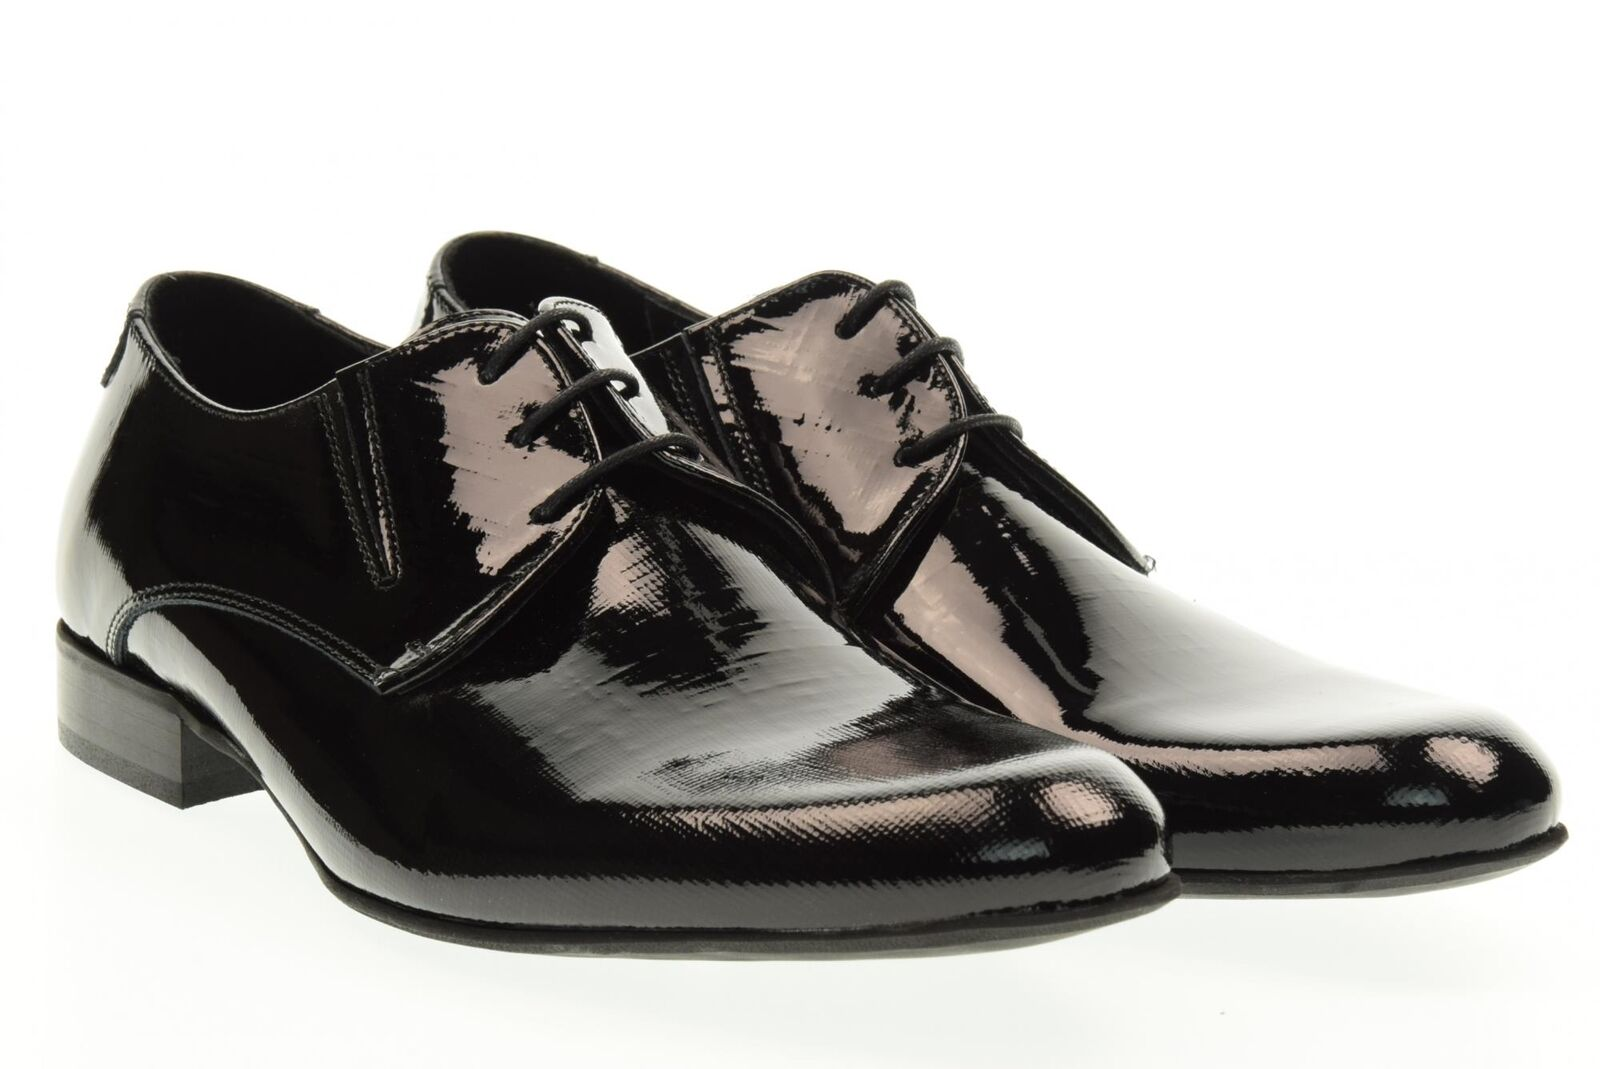 Eveet P17us 16510 Stylish Men's shoes